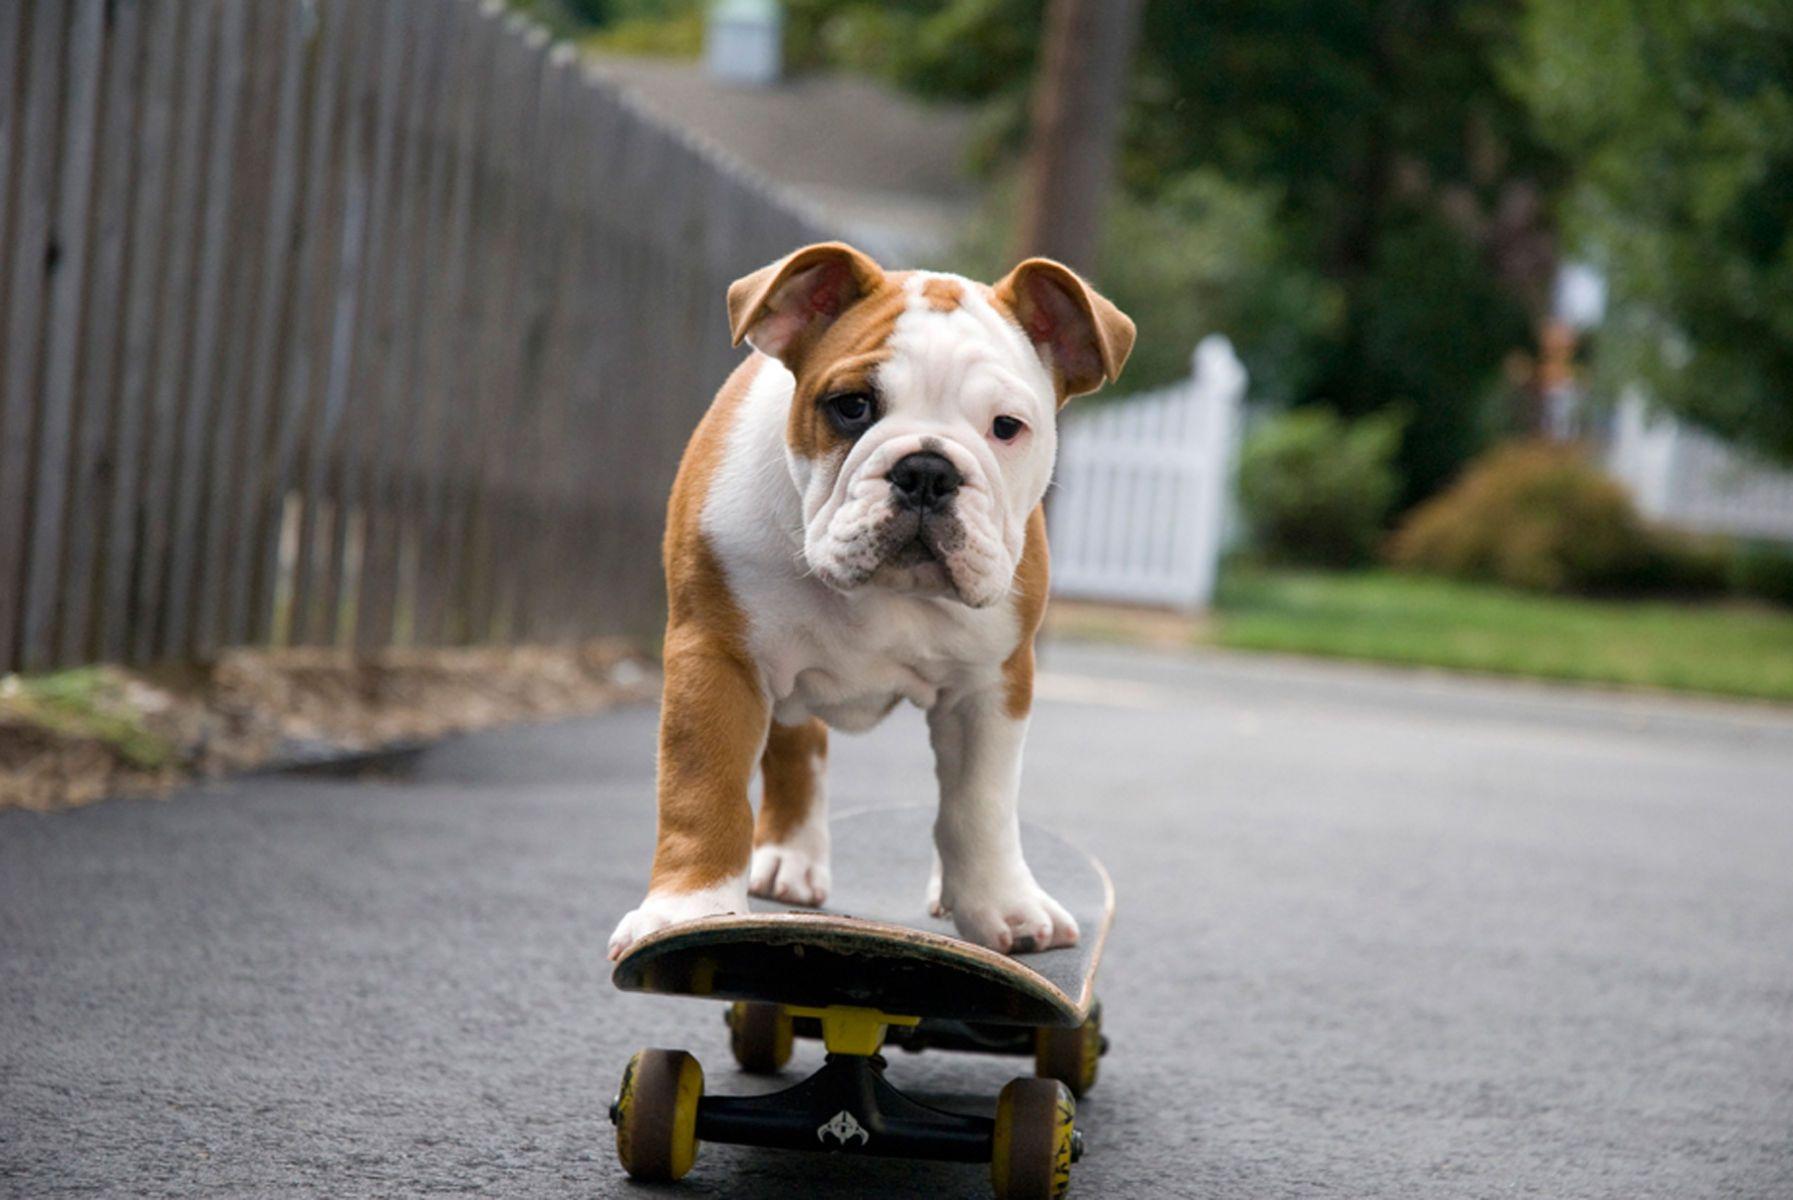 1bulldogpuppy94_colorlow